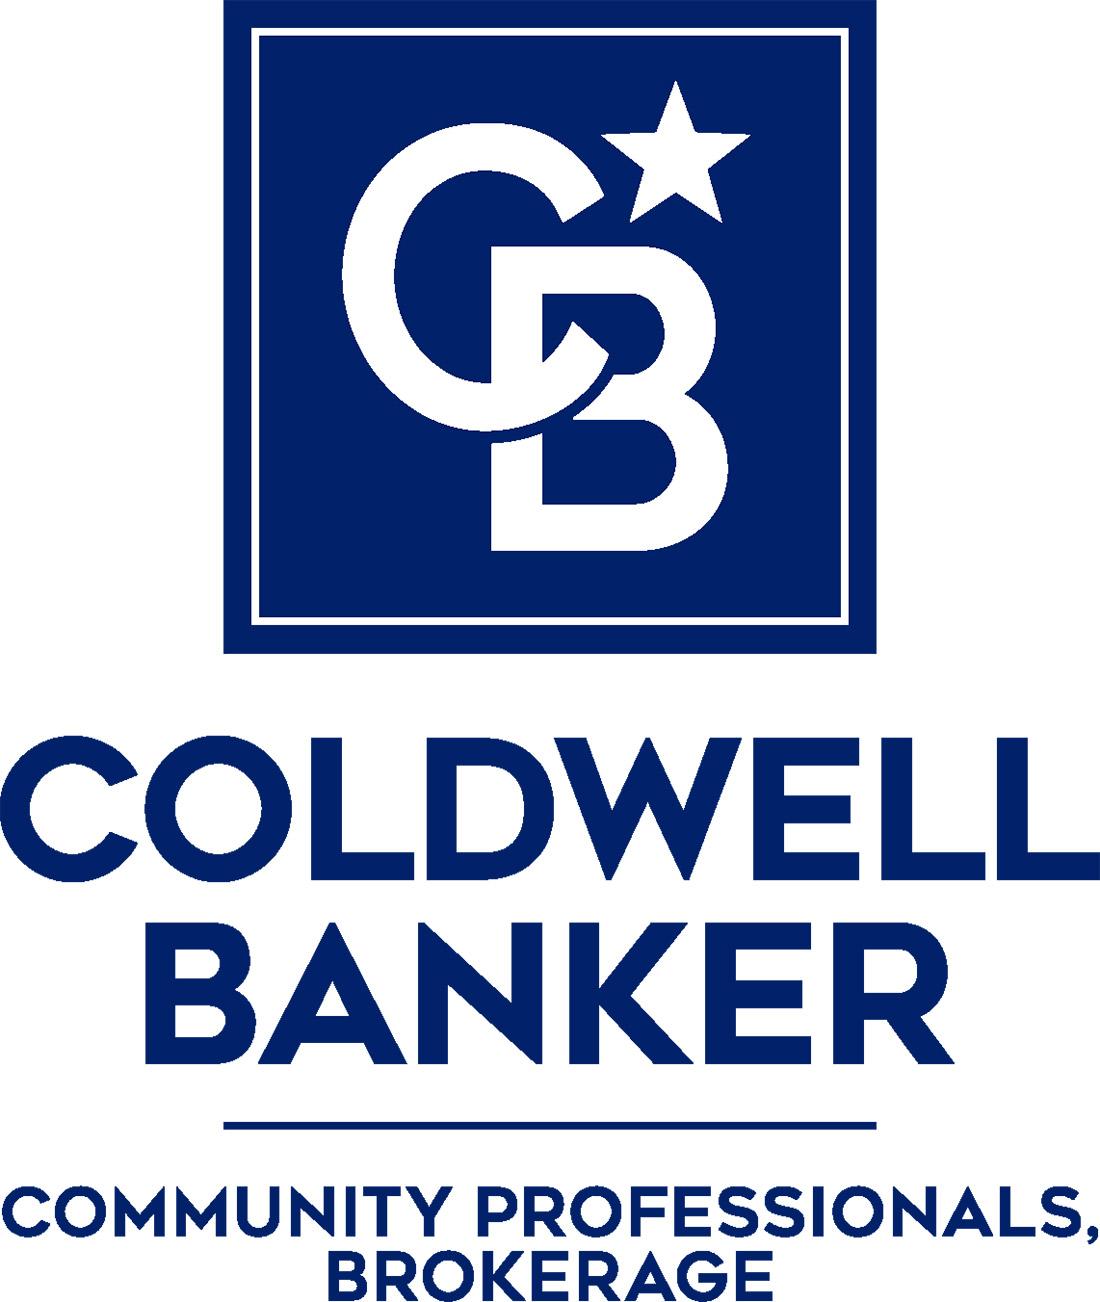 Jesse Dore - Coldwell Banker Community Professionals Logo